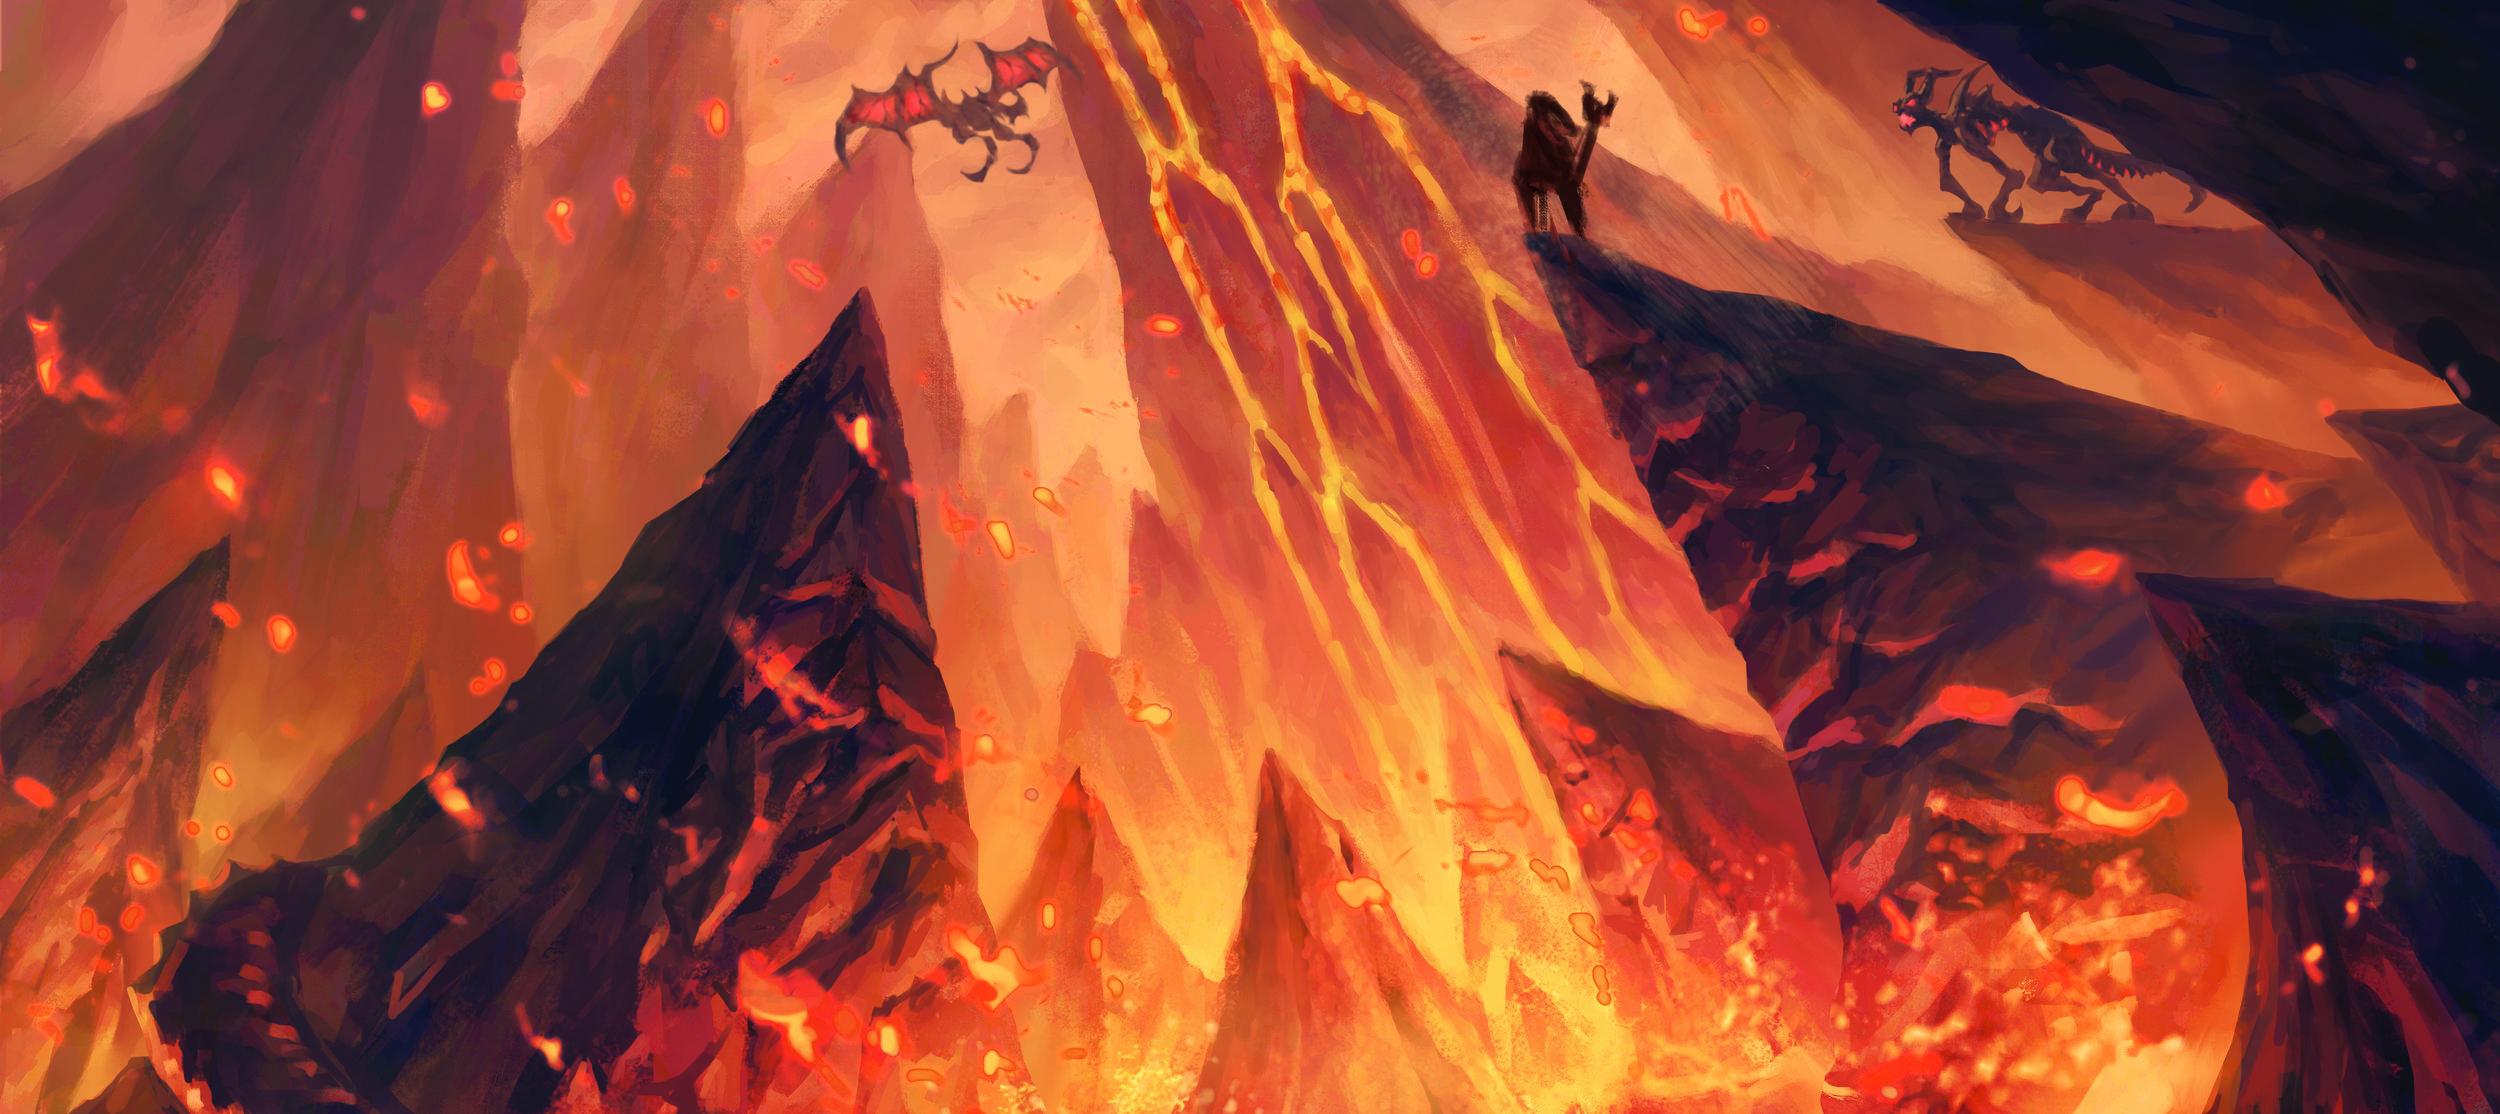 06Chaos-Inferno pits2.jpg